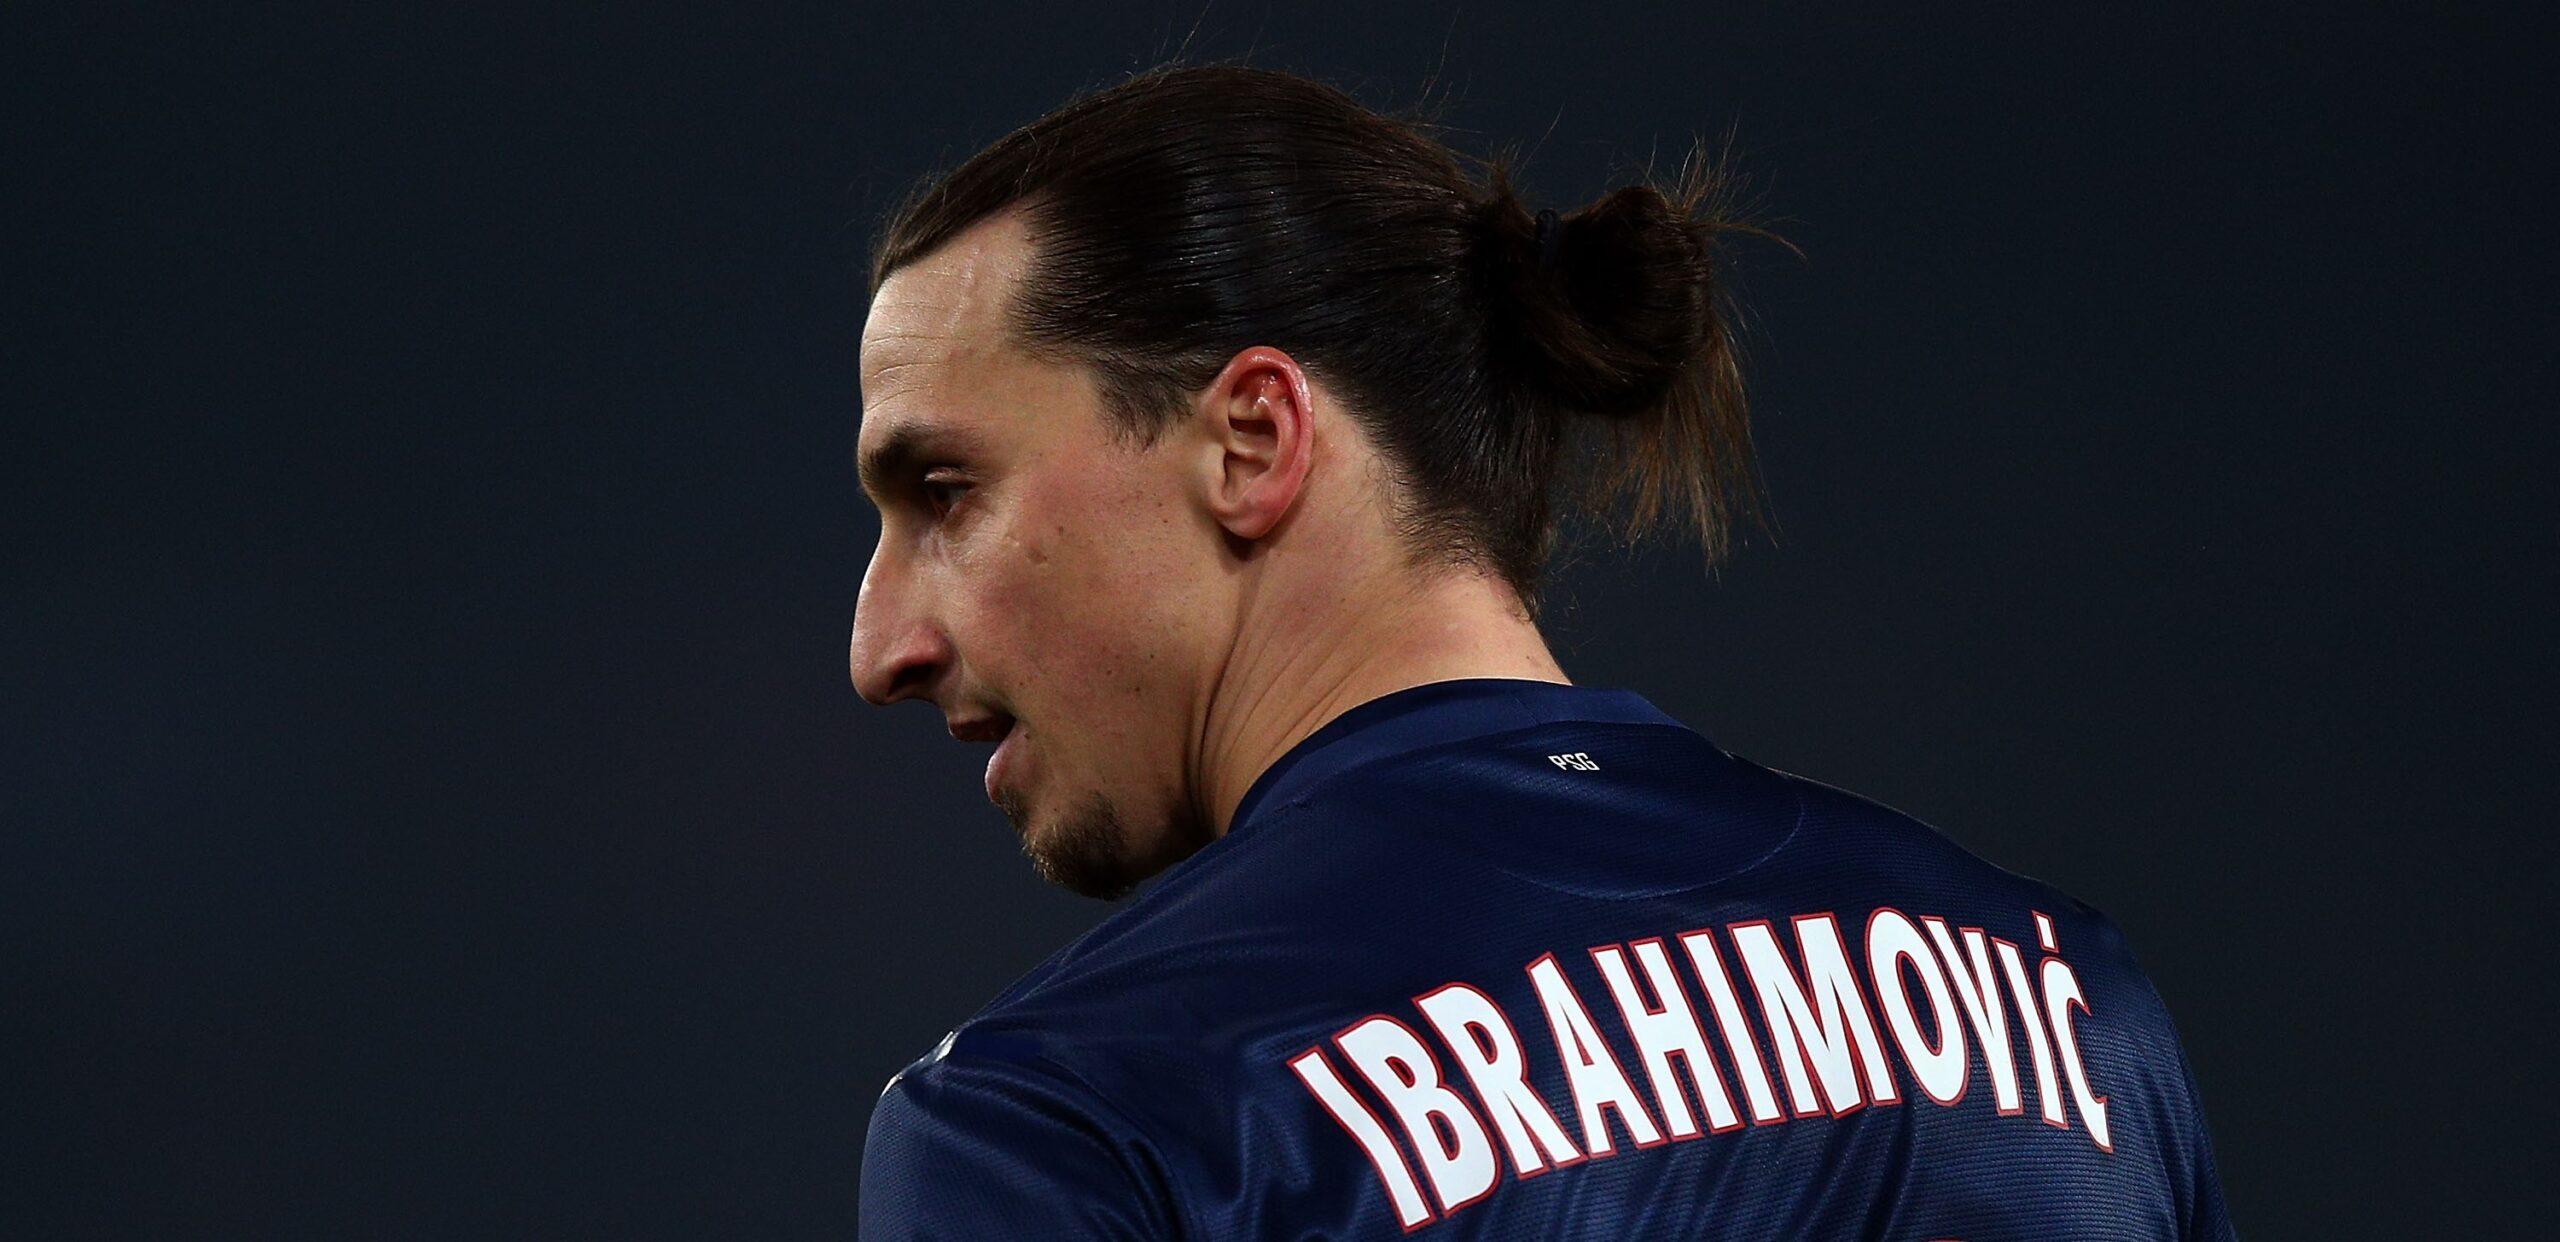 Zlatan Ibrahimovic Desktop